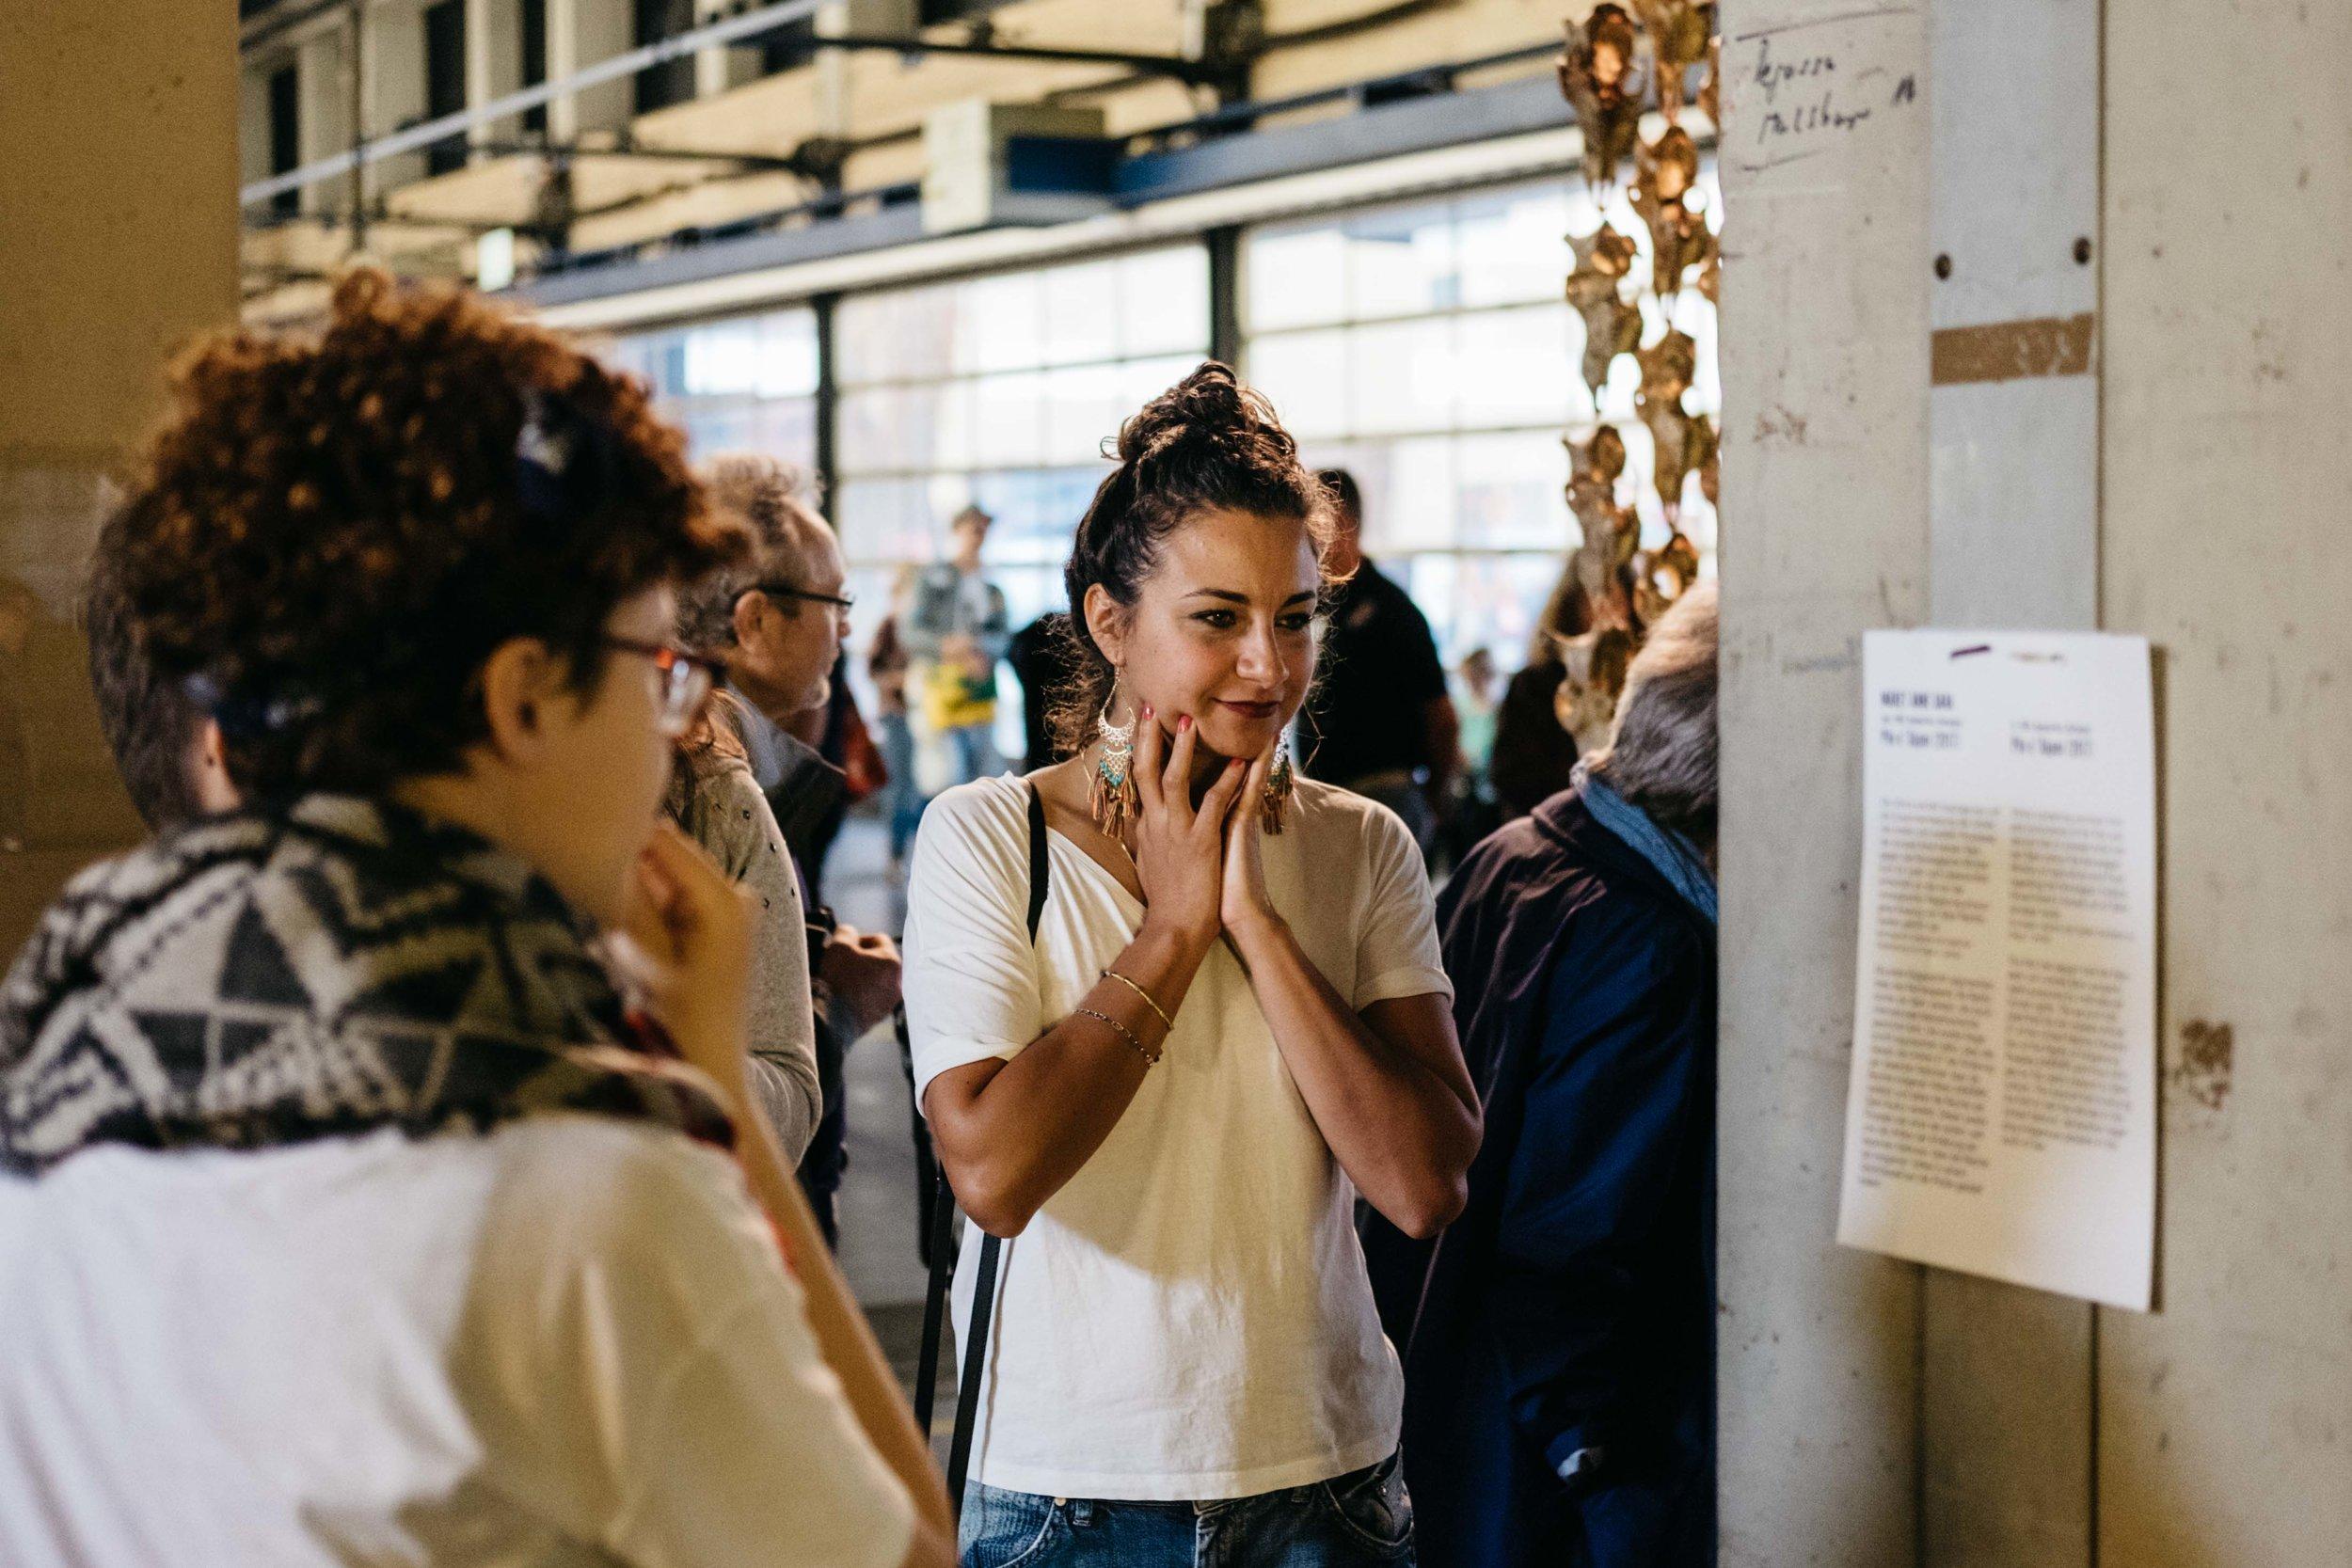 documenta14-kassel-kunst-wearecity-simonhariman-2017-27.jpg